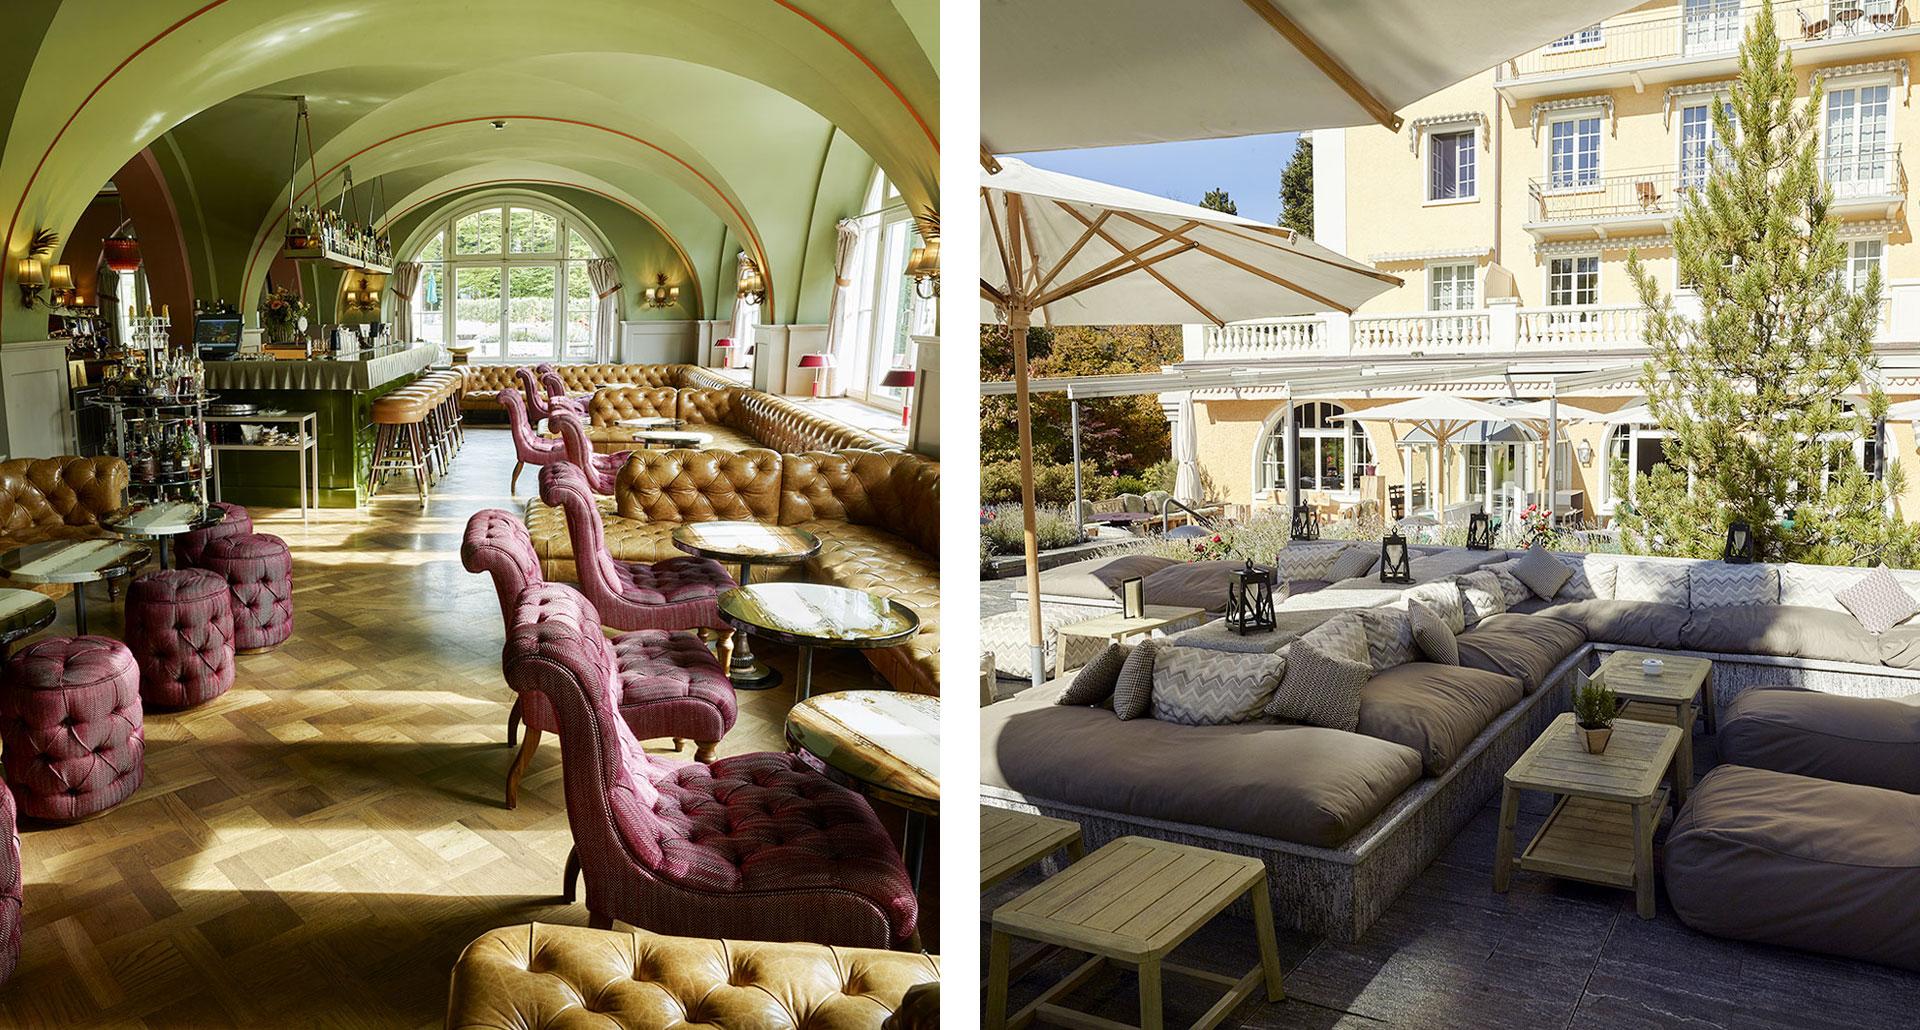 Le Grand Bellevue - boutique hotel in Switzerland